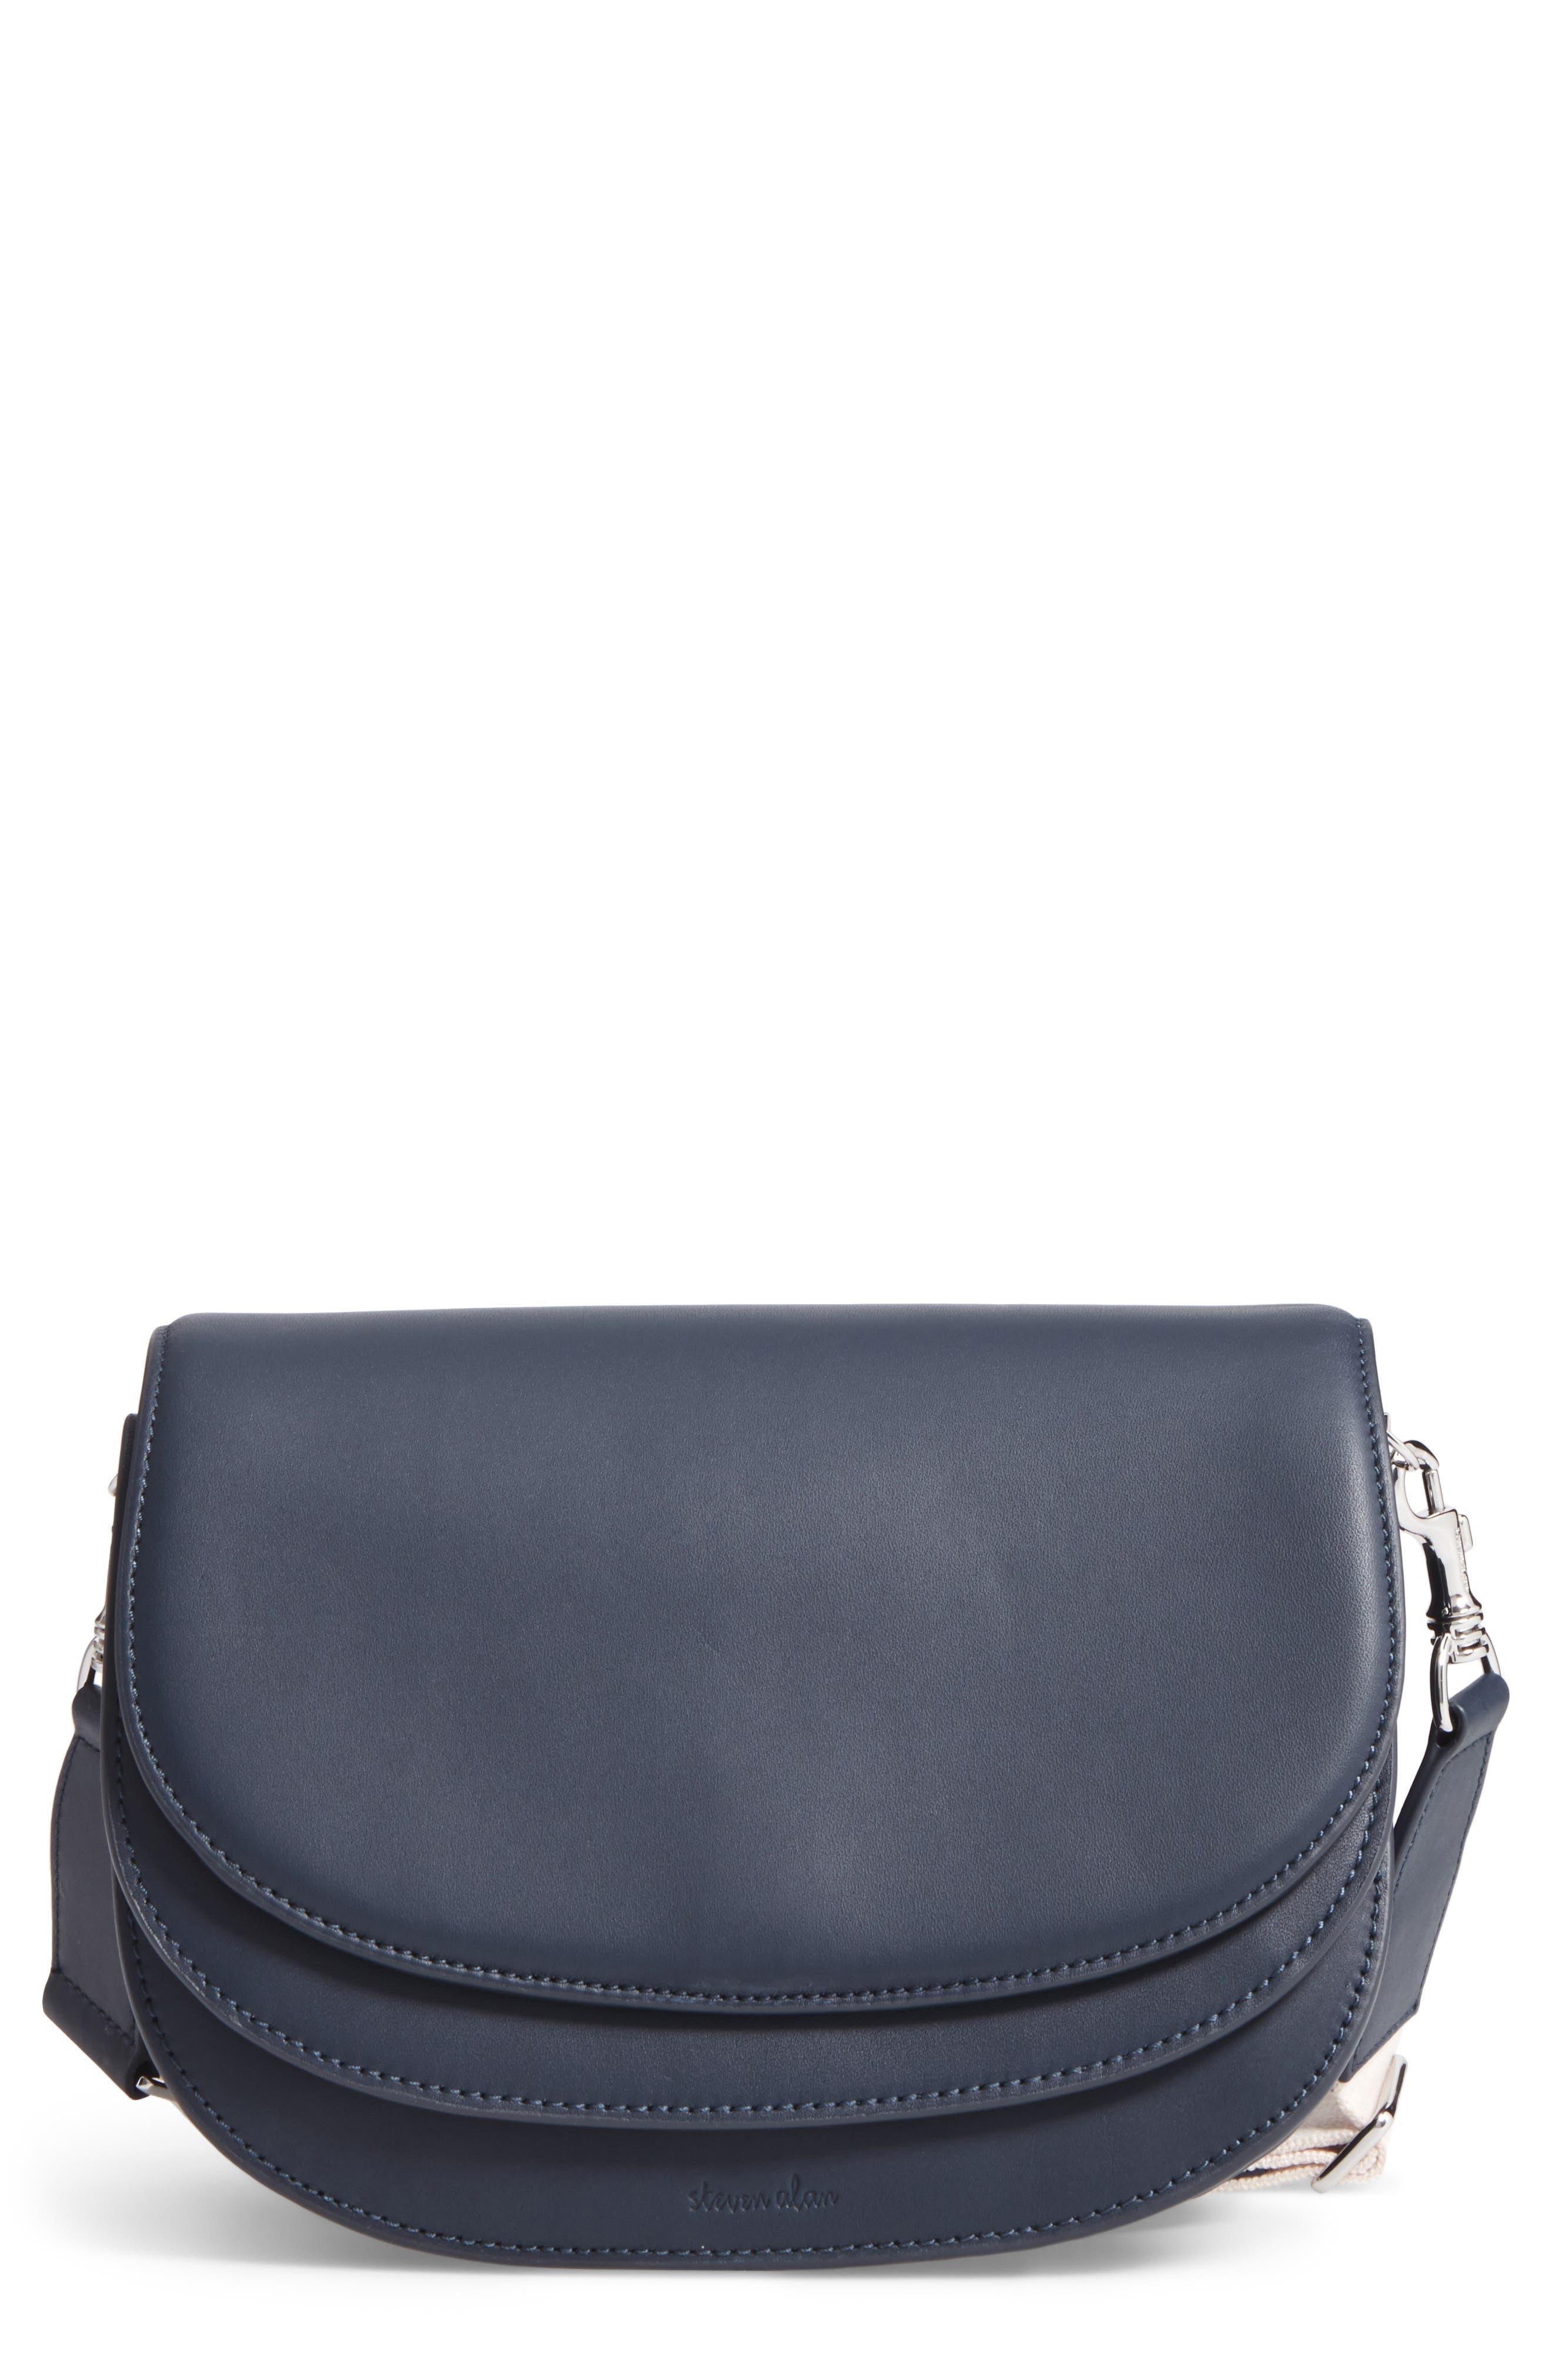 Steven Alan Landon Leather Crossbody Bag